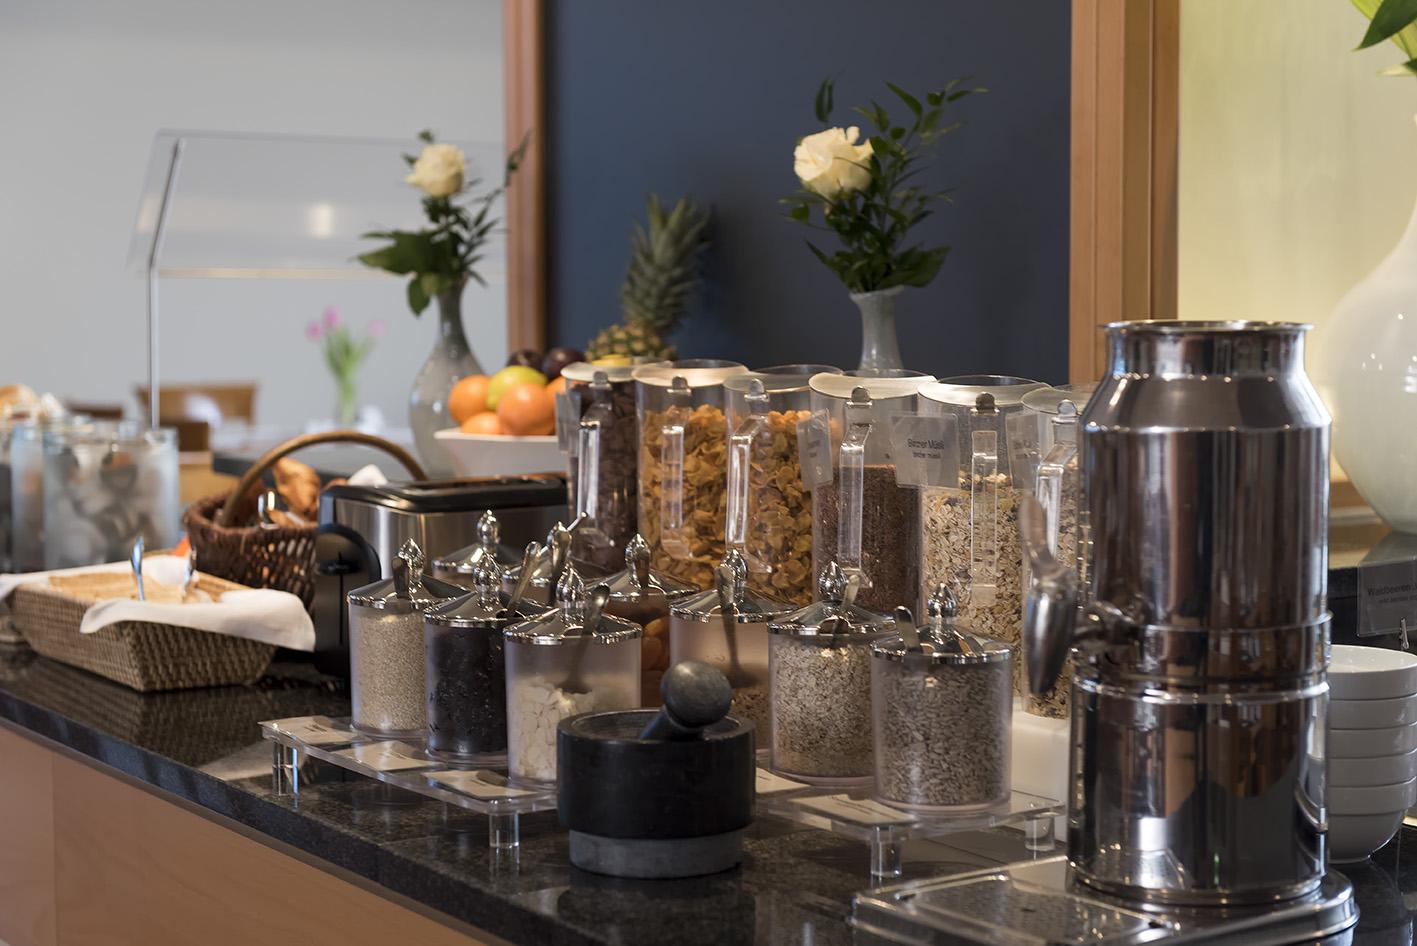 restaurants in dortmund mitte best western dortmund hotel. Black Bedroom Furniture Sets. Home Design Ideas